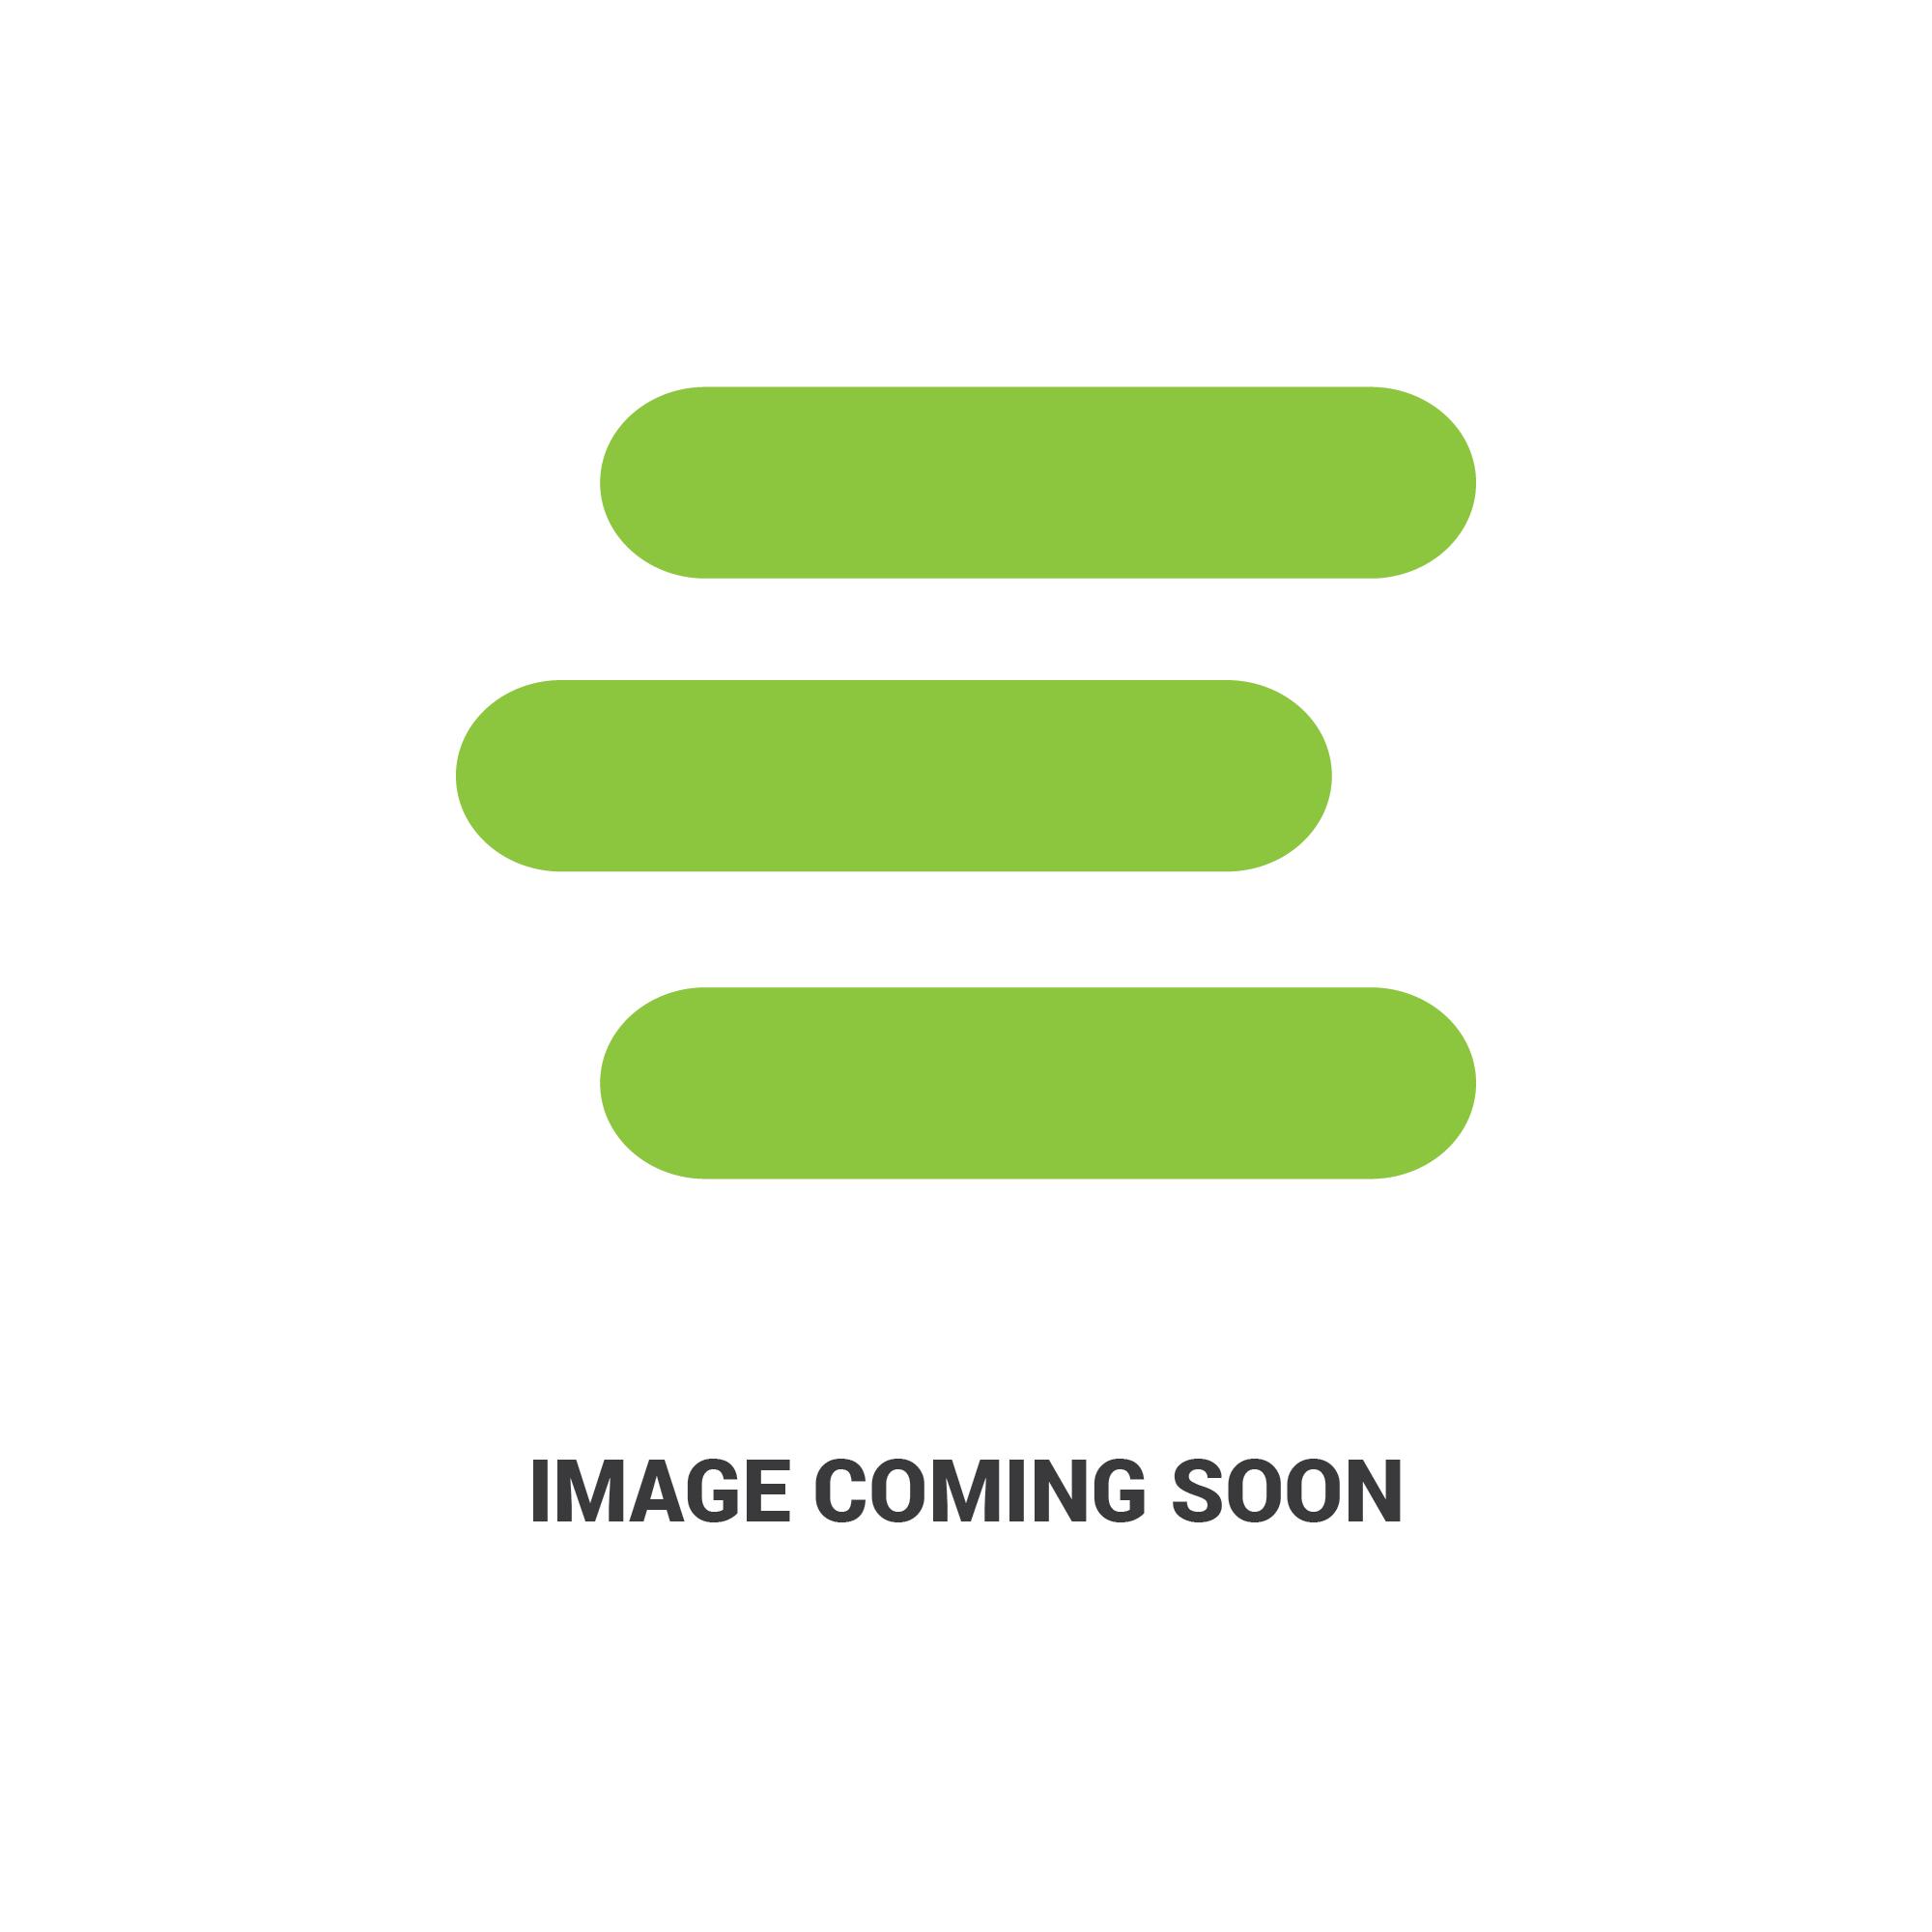 E-133743613edit 3.jpg